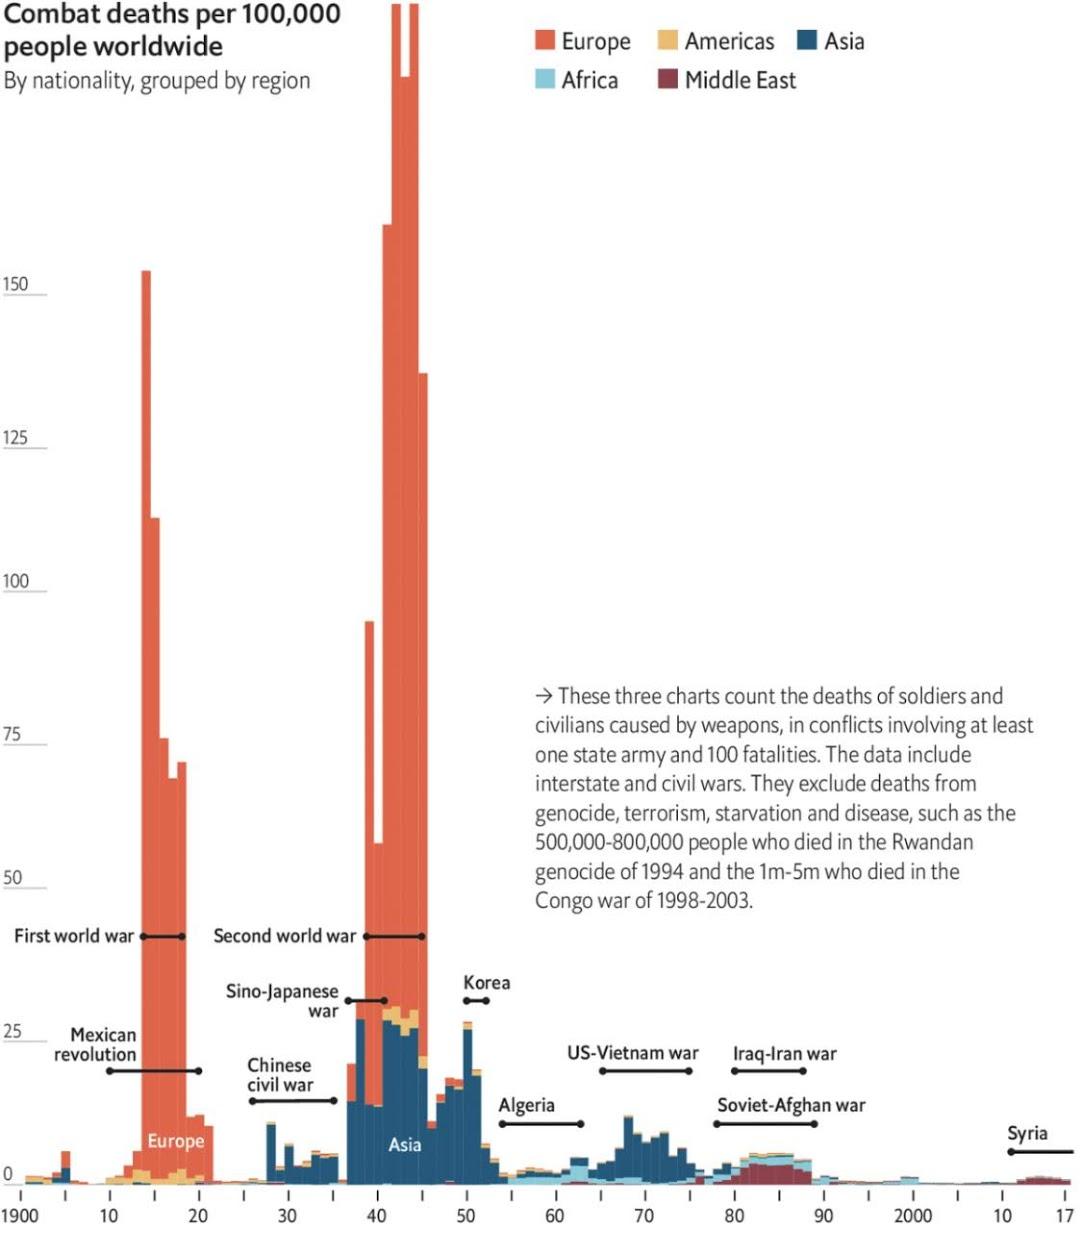 War fatalities per 100,000 soldiers over the last century